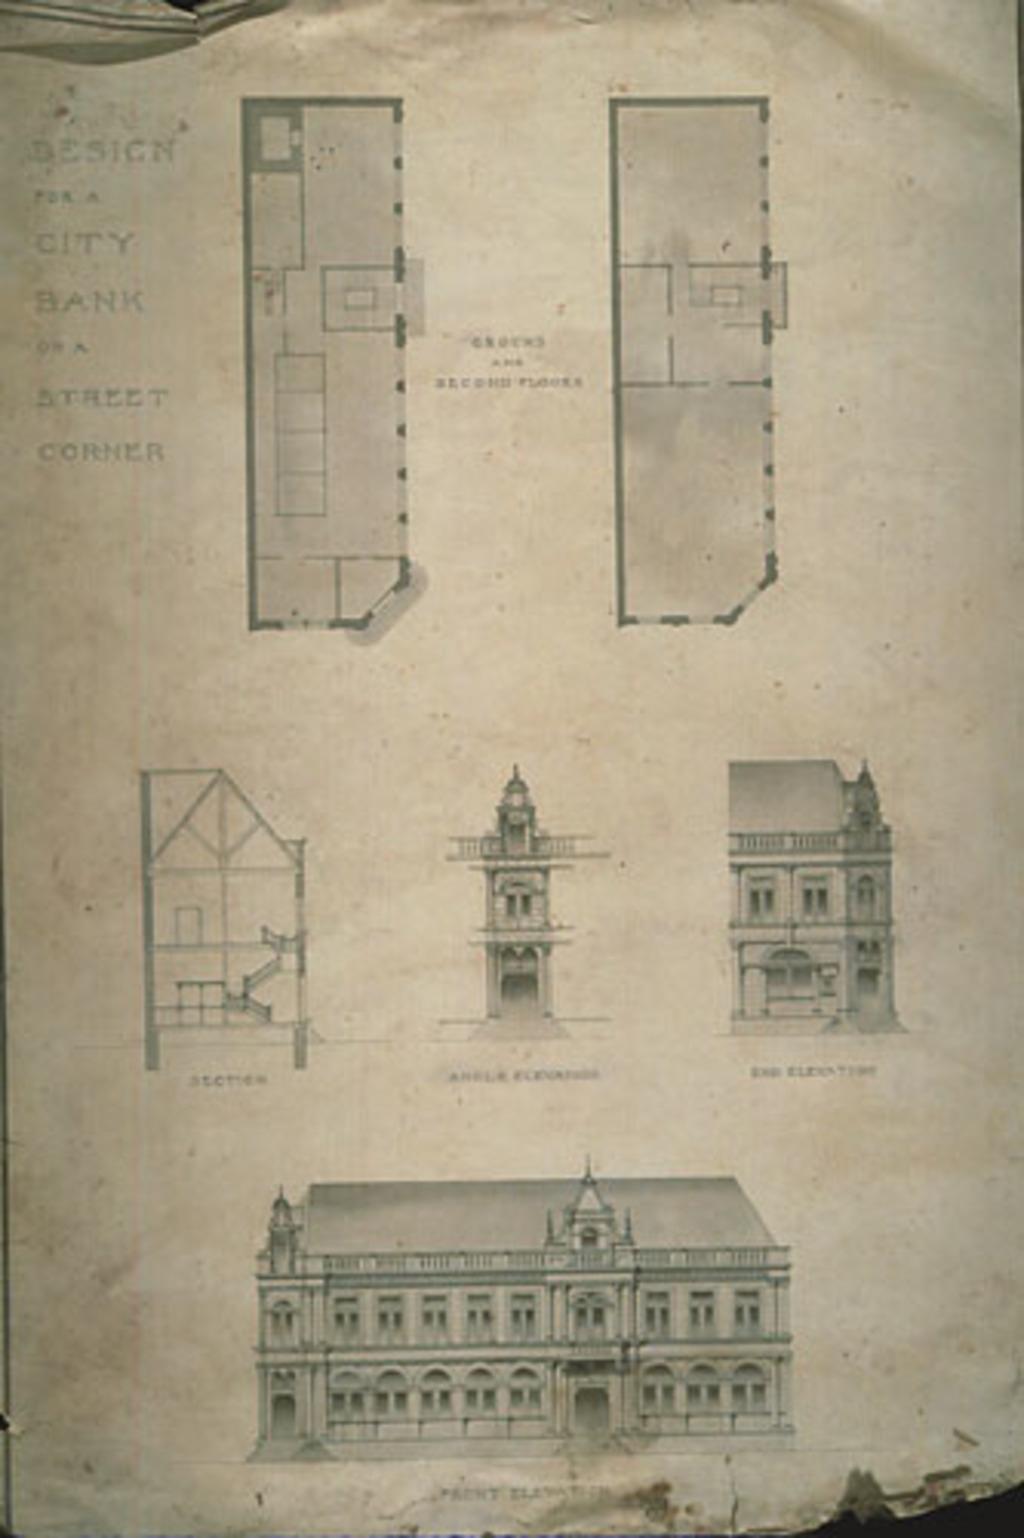 Design for a City Bank on a Street Corner